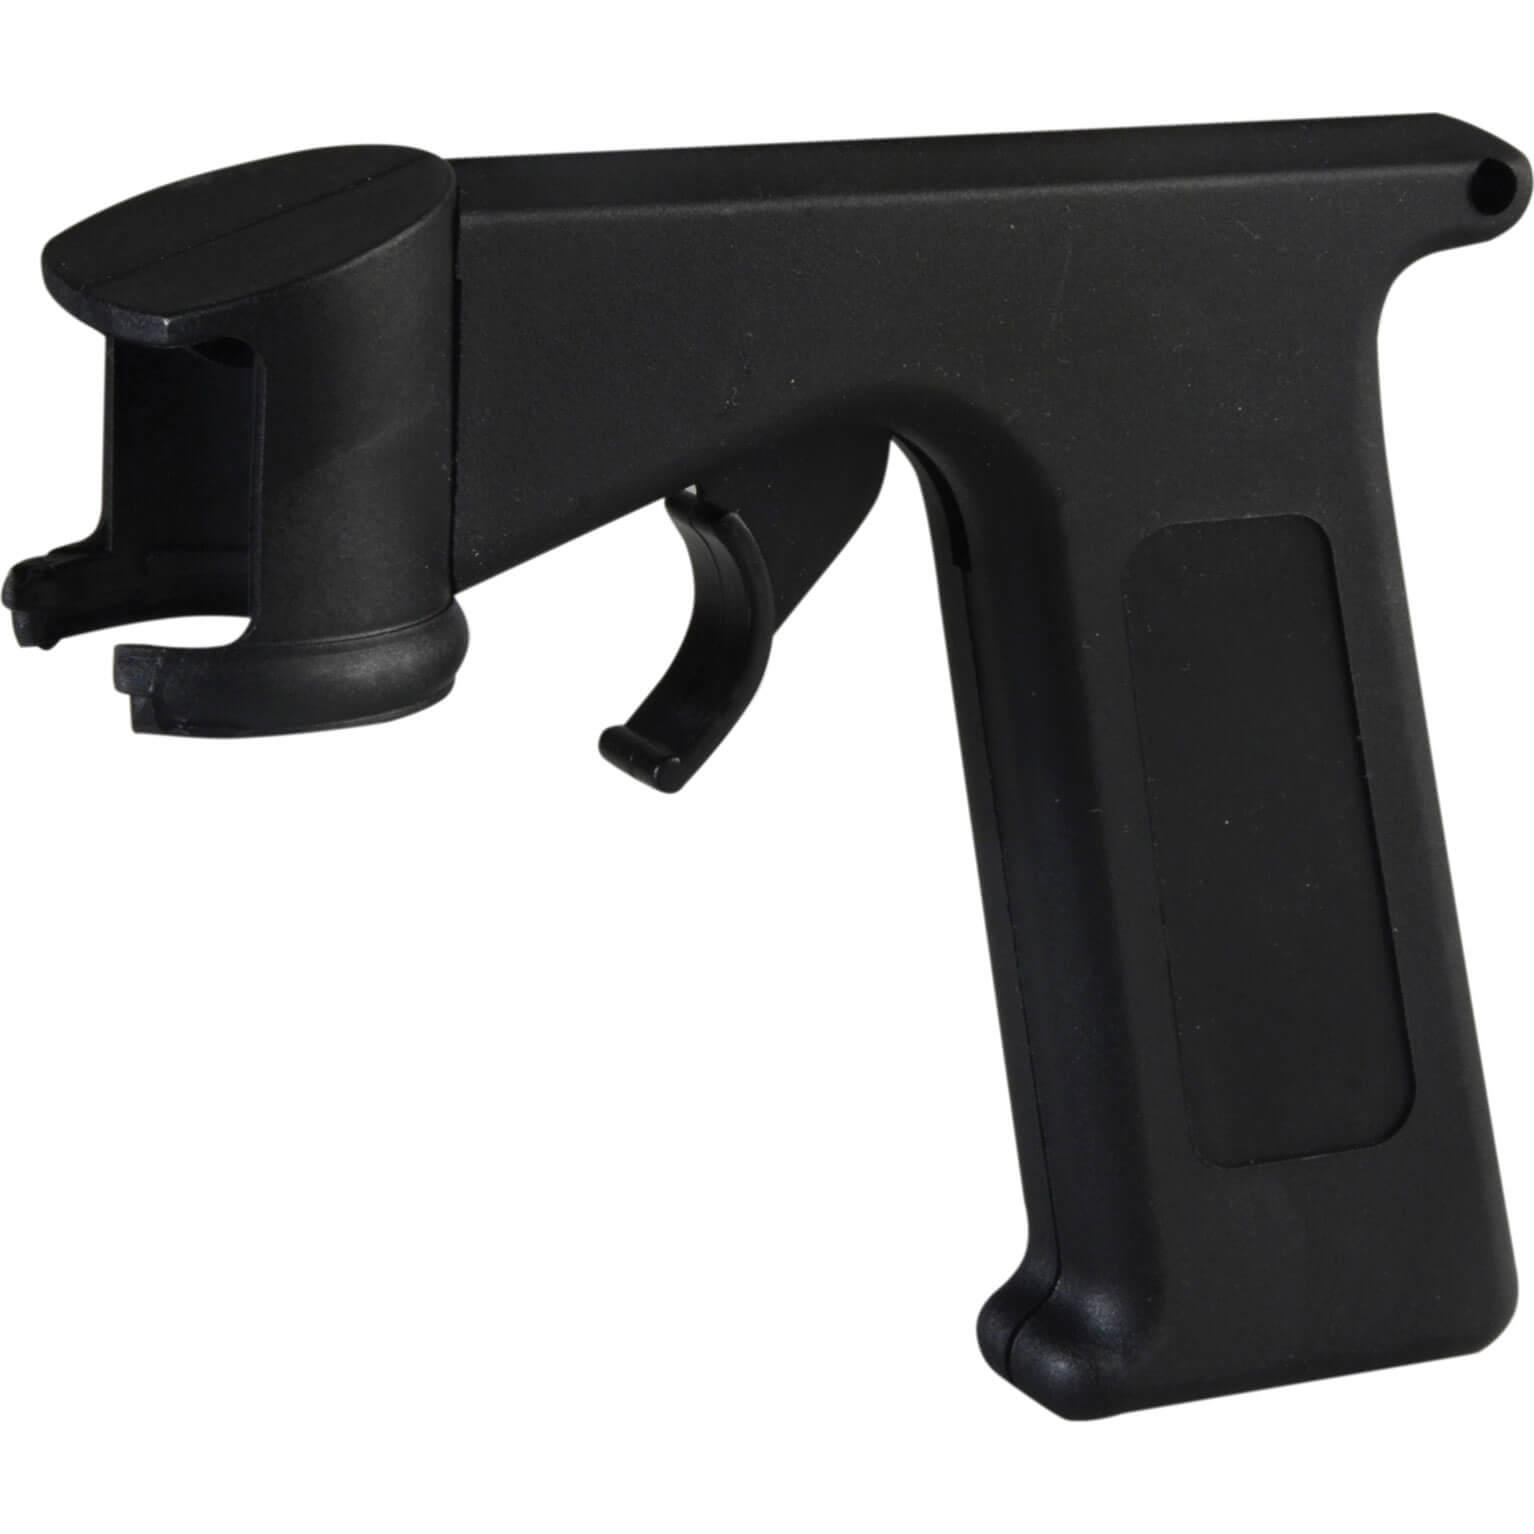 Image of Plastikote Can Gun Trigger